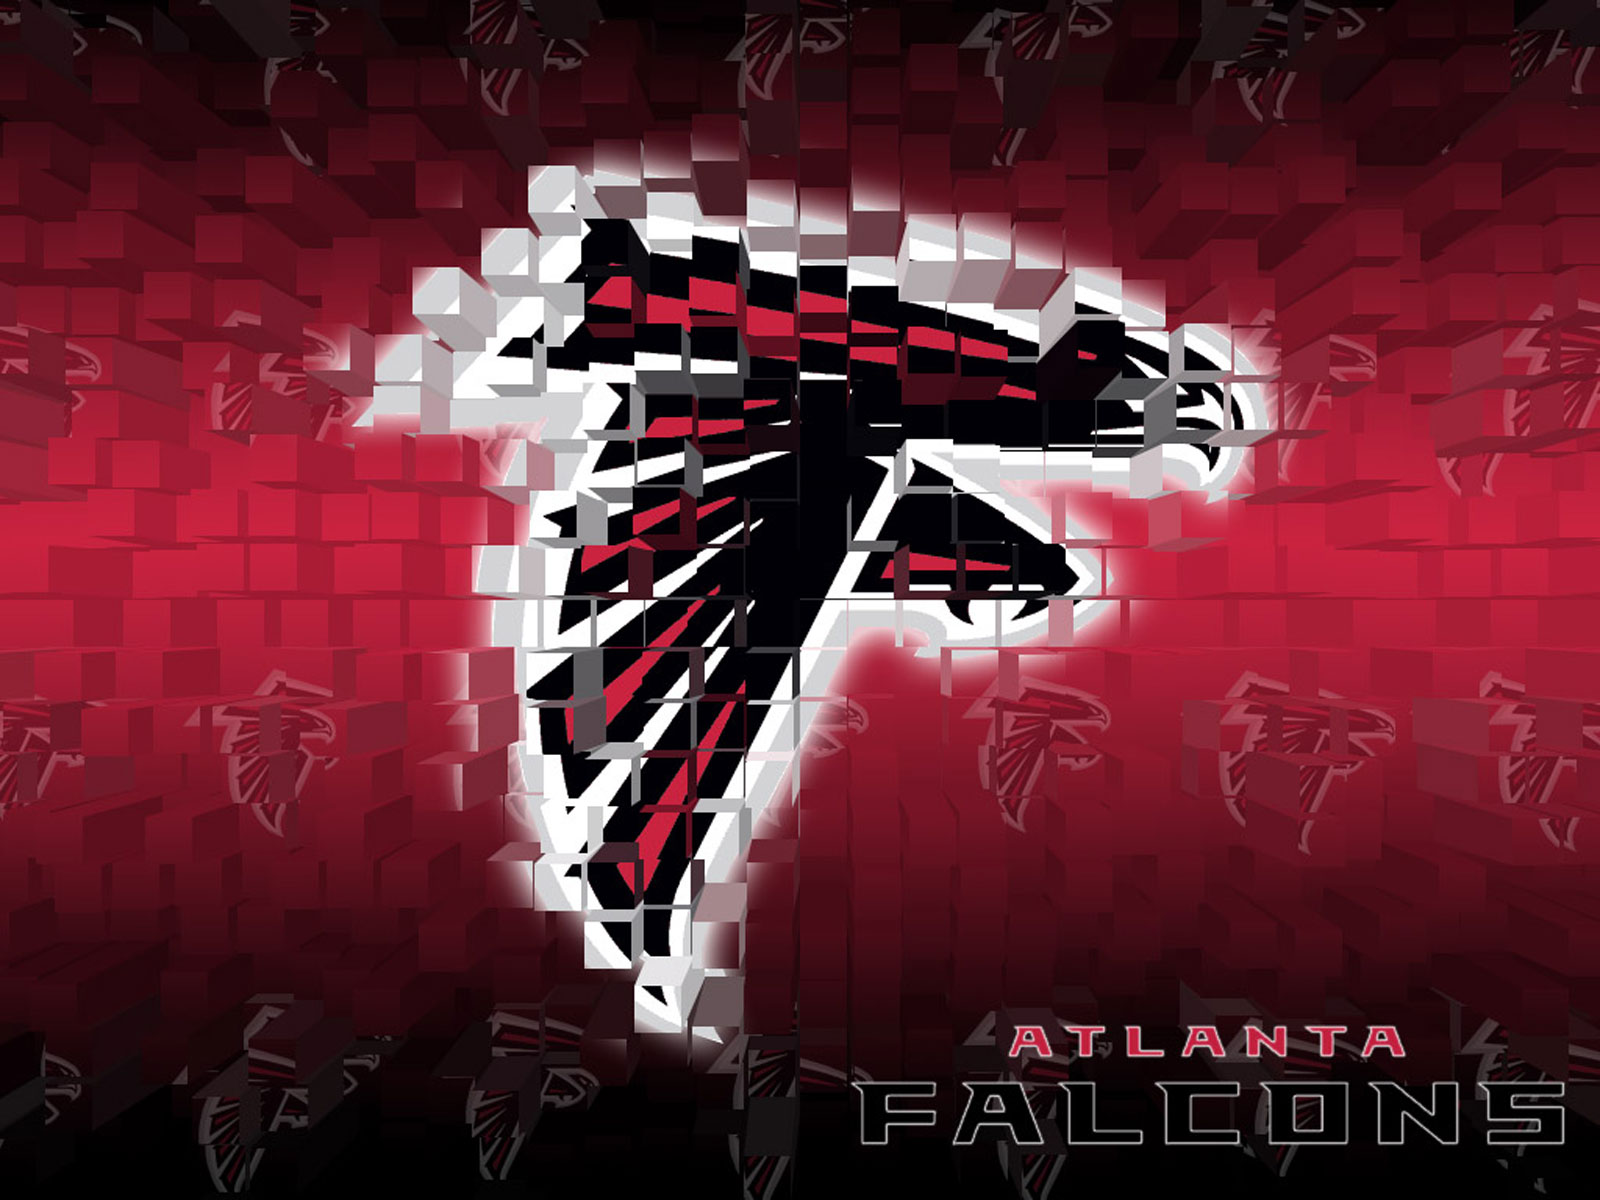 Atlanta Falcons Wallpapers HD Wallpapers Early 1600x1200